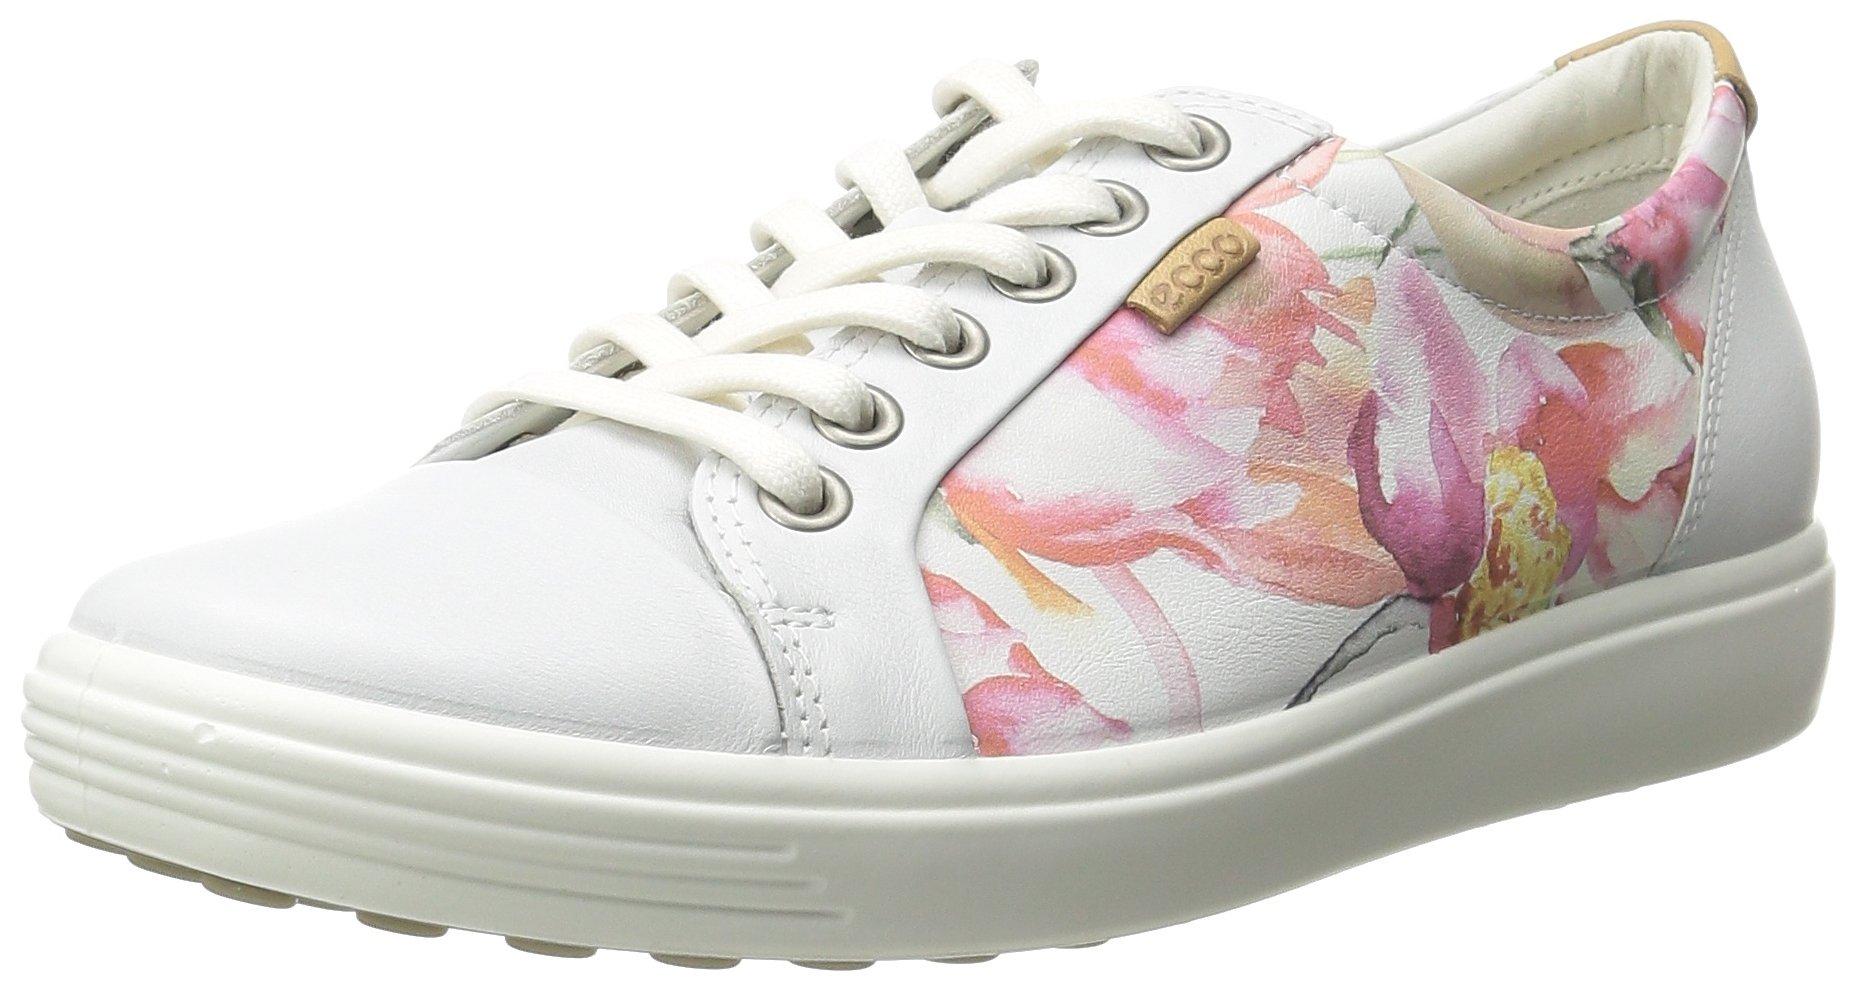 ECCO Footwear Womens Soft 7 Sneaker Oxford, White Floral Print/Powder, 41 EU/10-10.5 M US